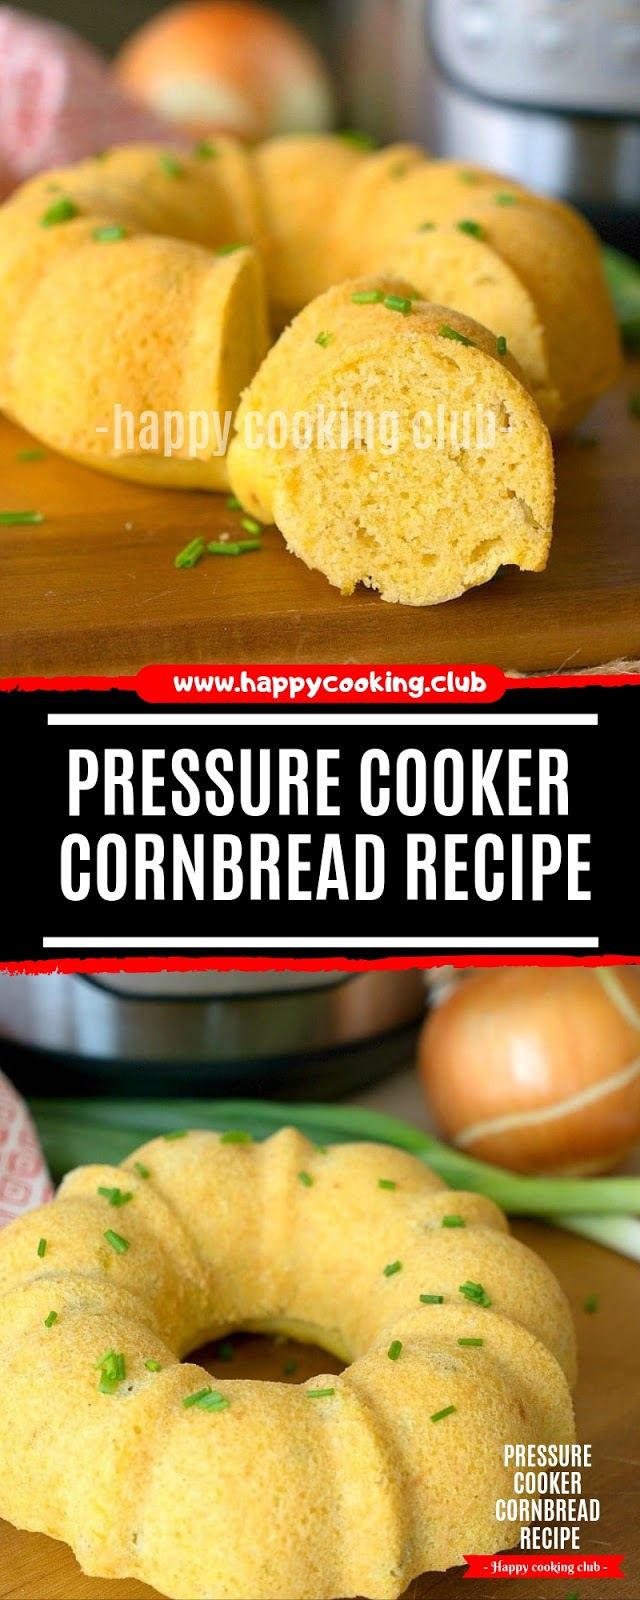 Pressure Cooker Cornbread Recipe